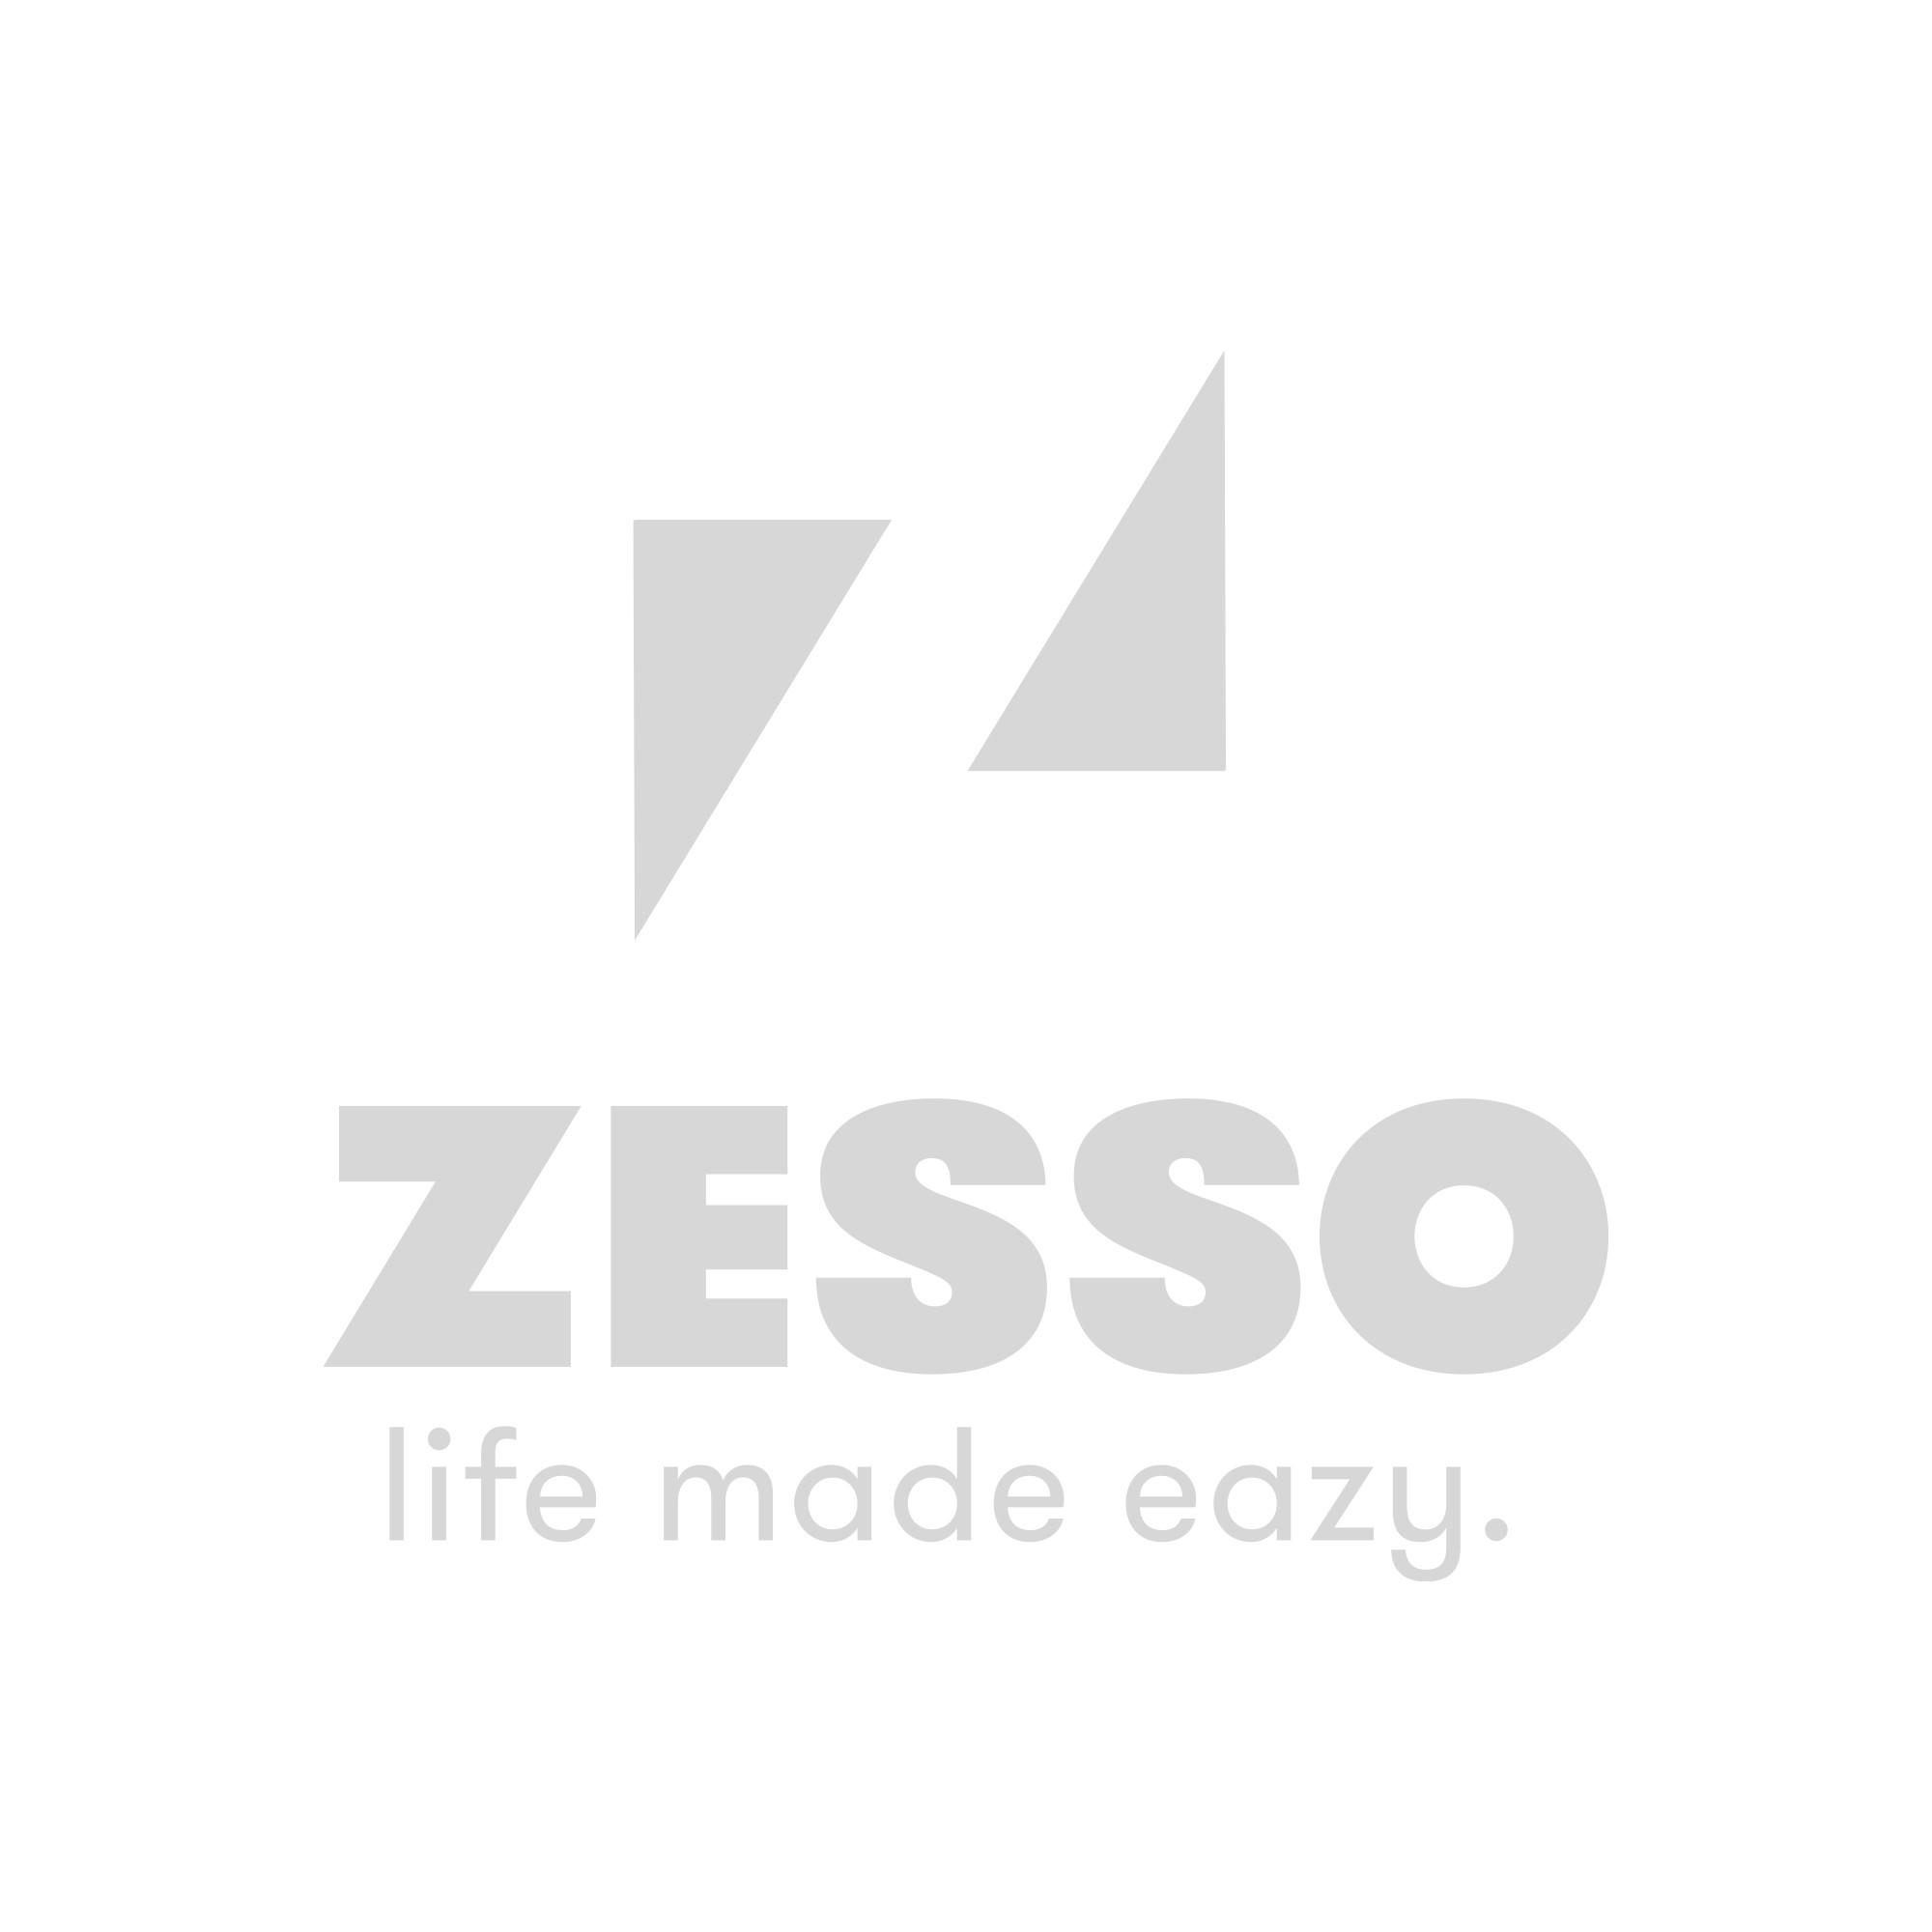 Trois Kilos Sept Babypyjama Set 6 Maanden Cat & Grey Hearts